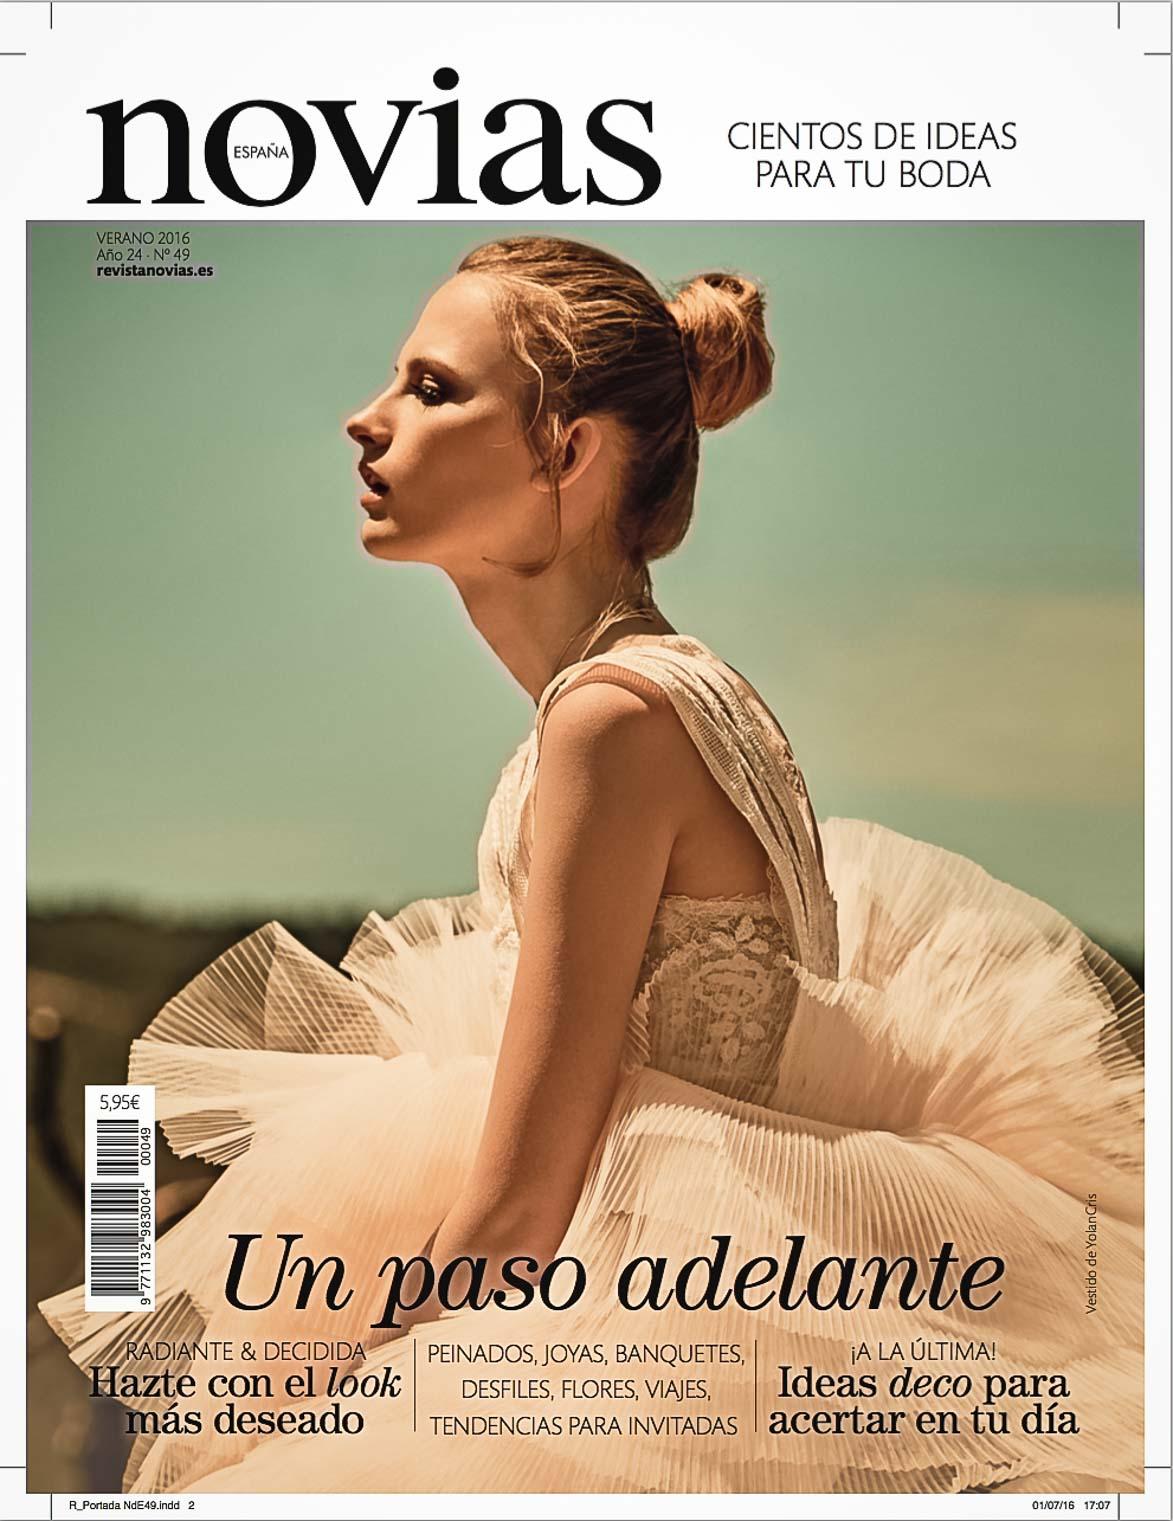 Publicacion en Revista Novias España-1